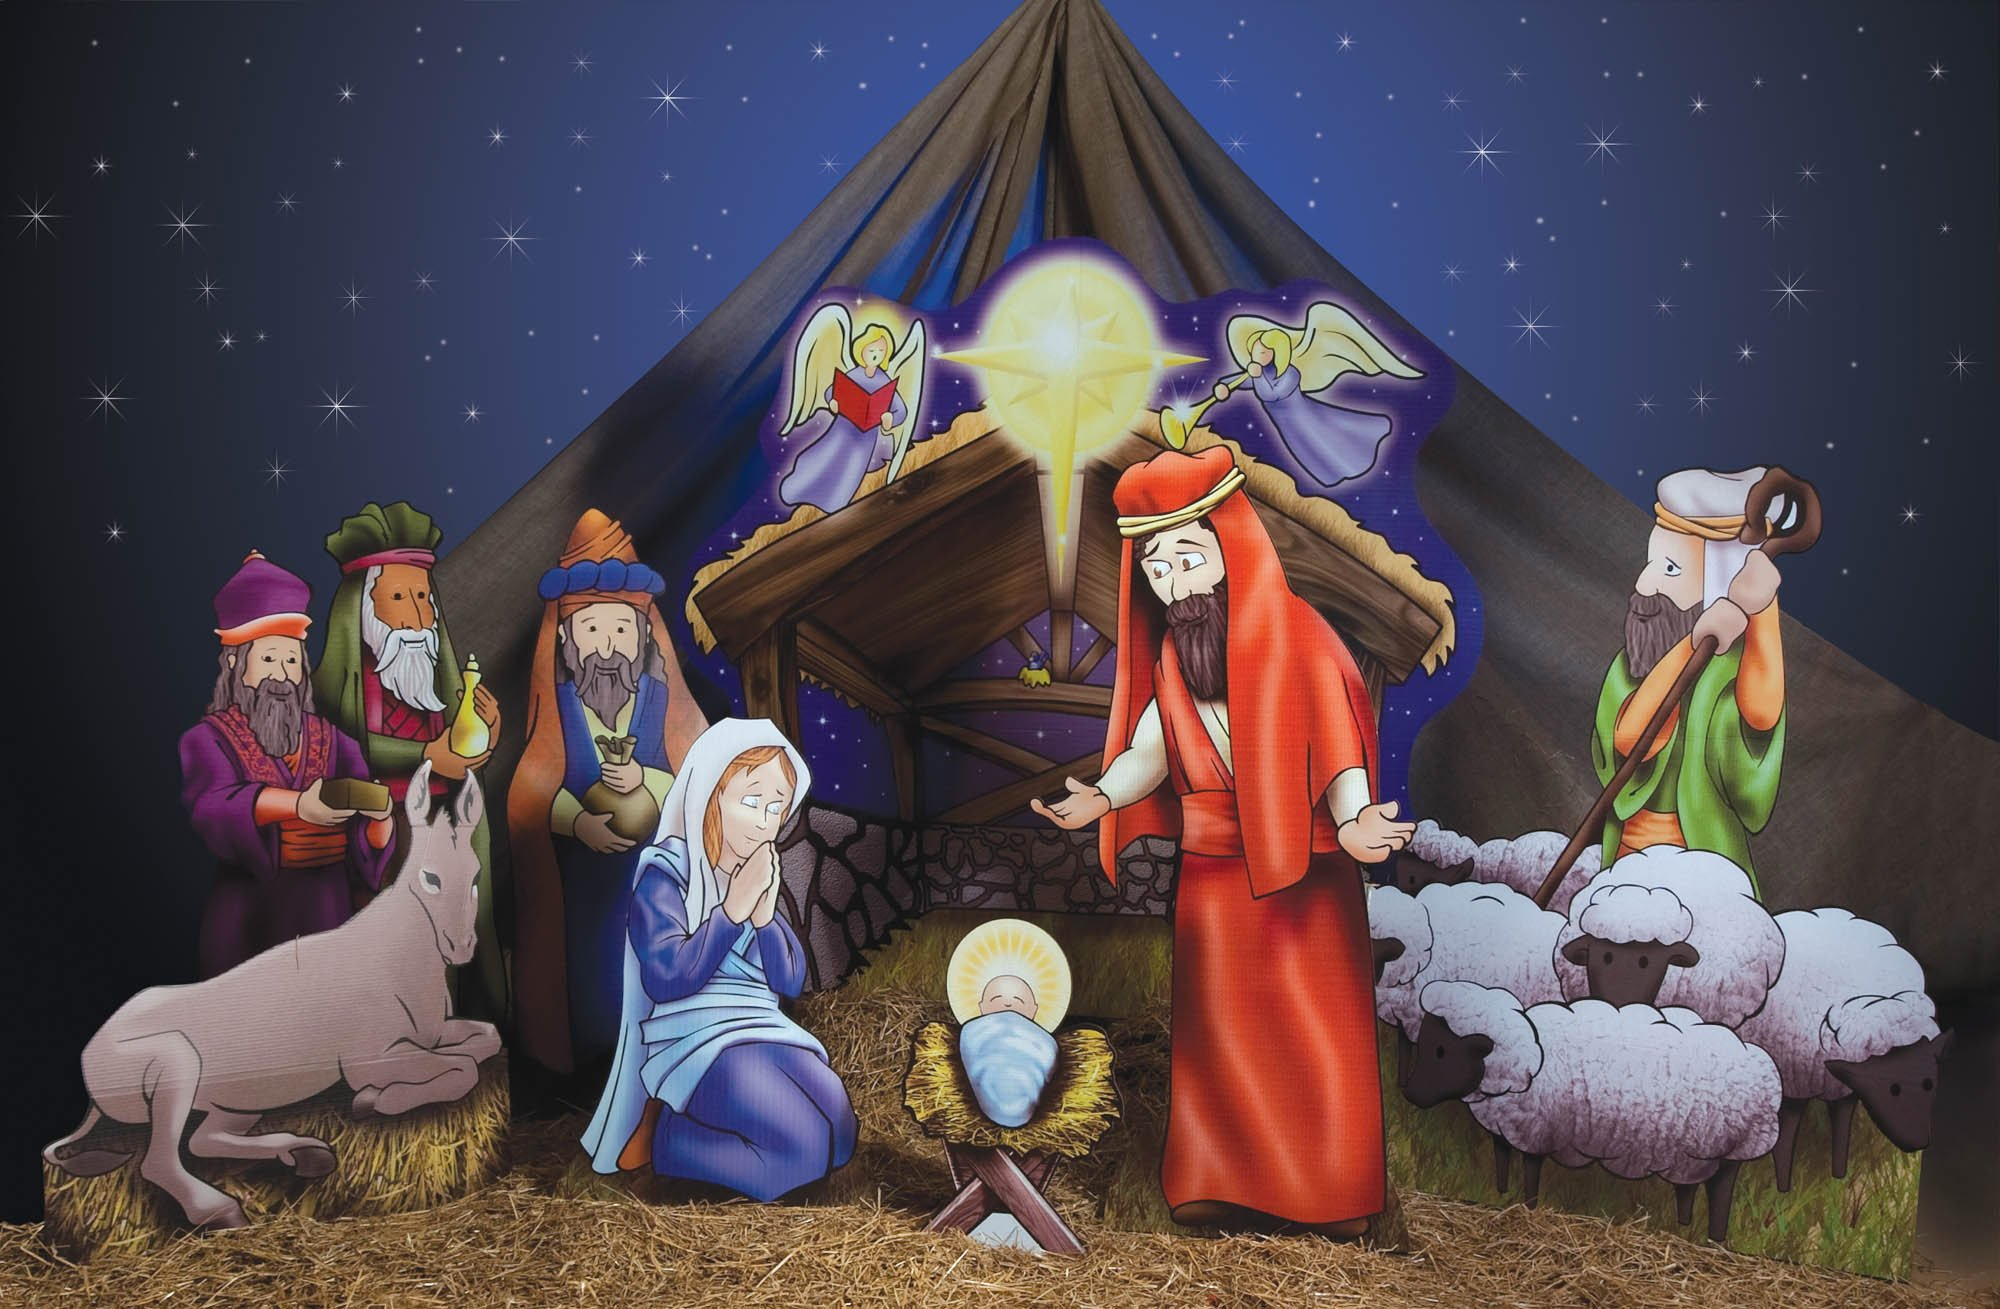 Christmas Nativity Scene Props by Shindigz (Image #1)